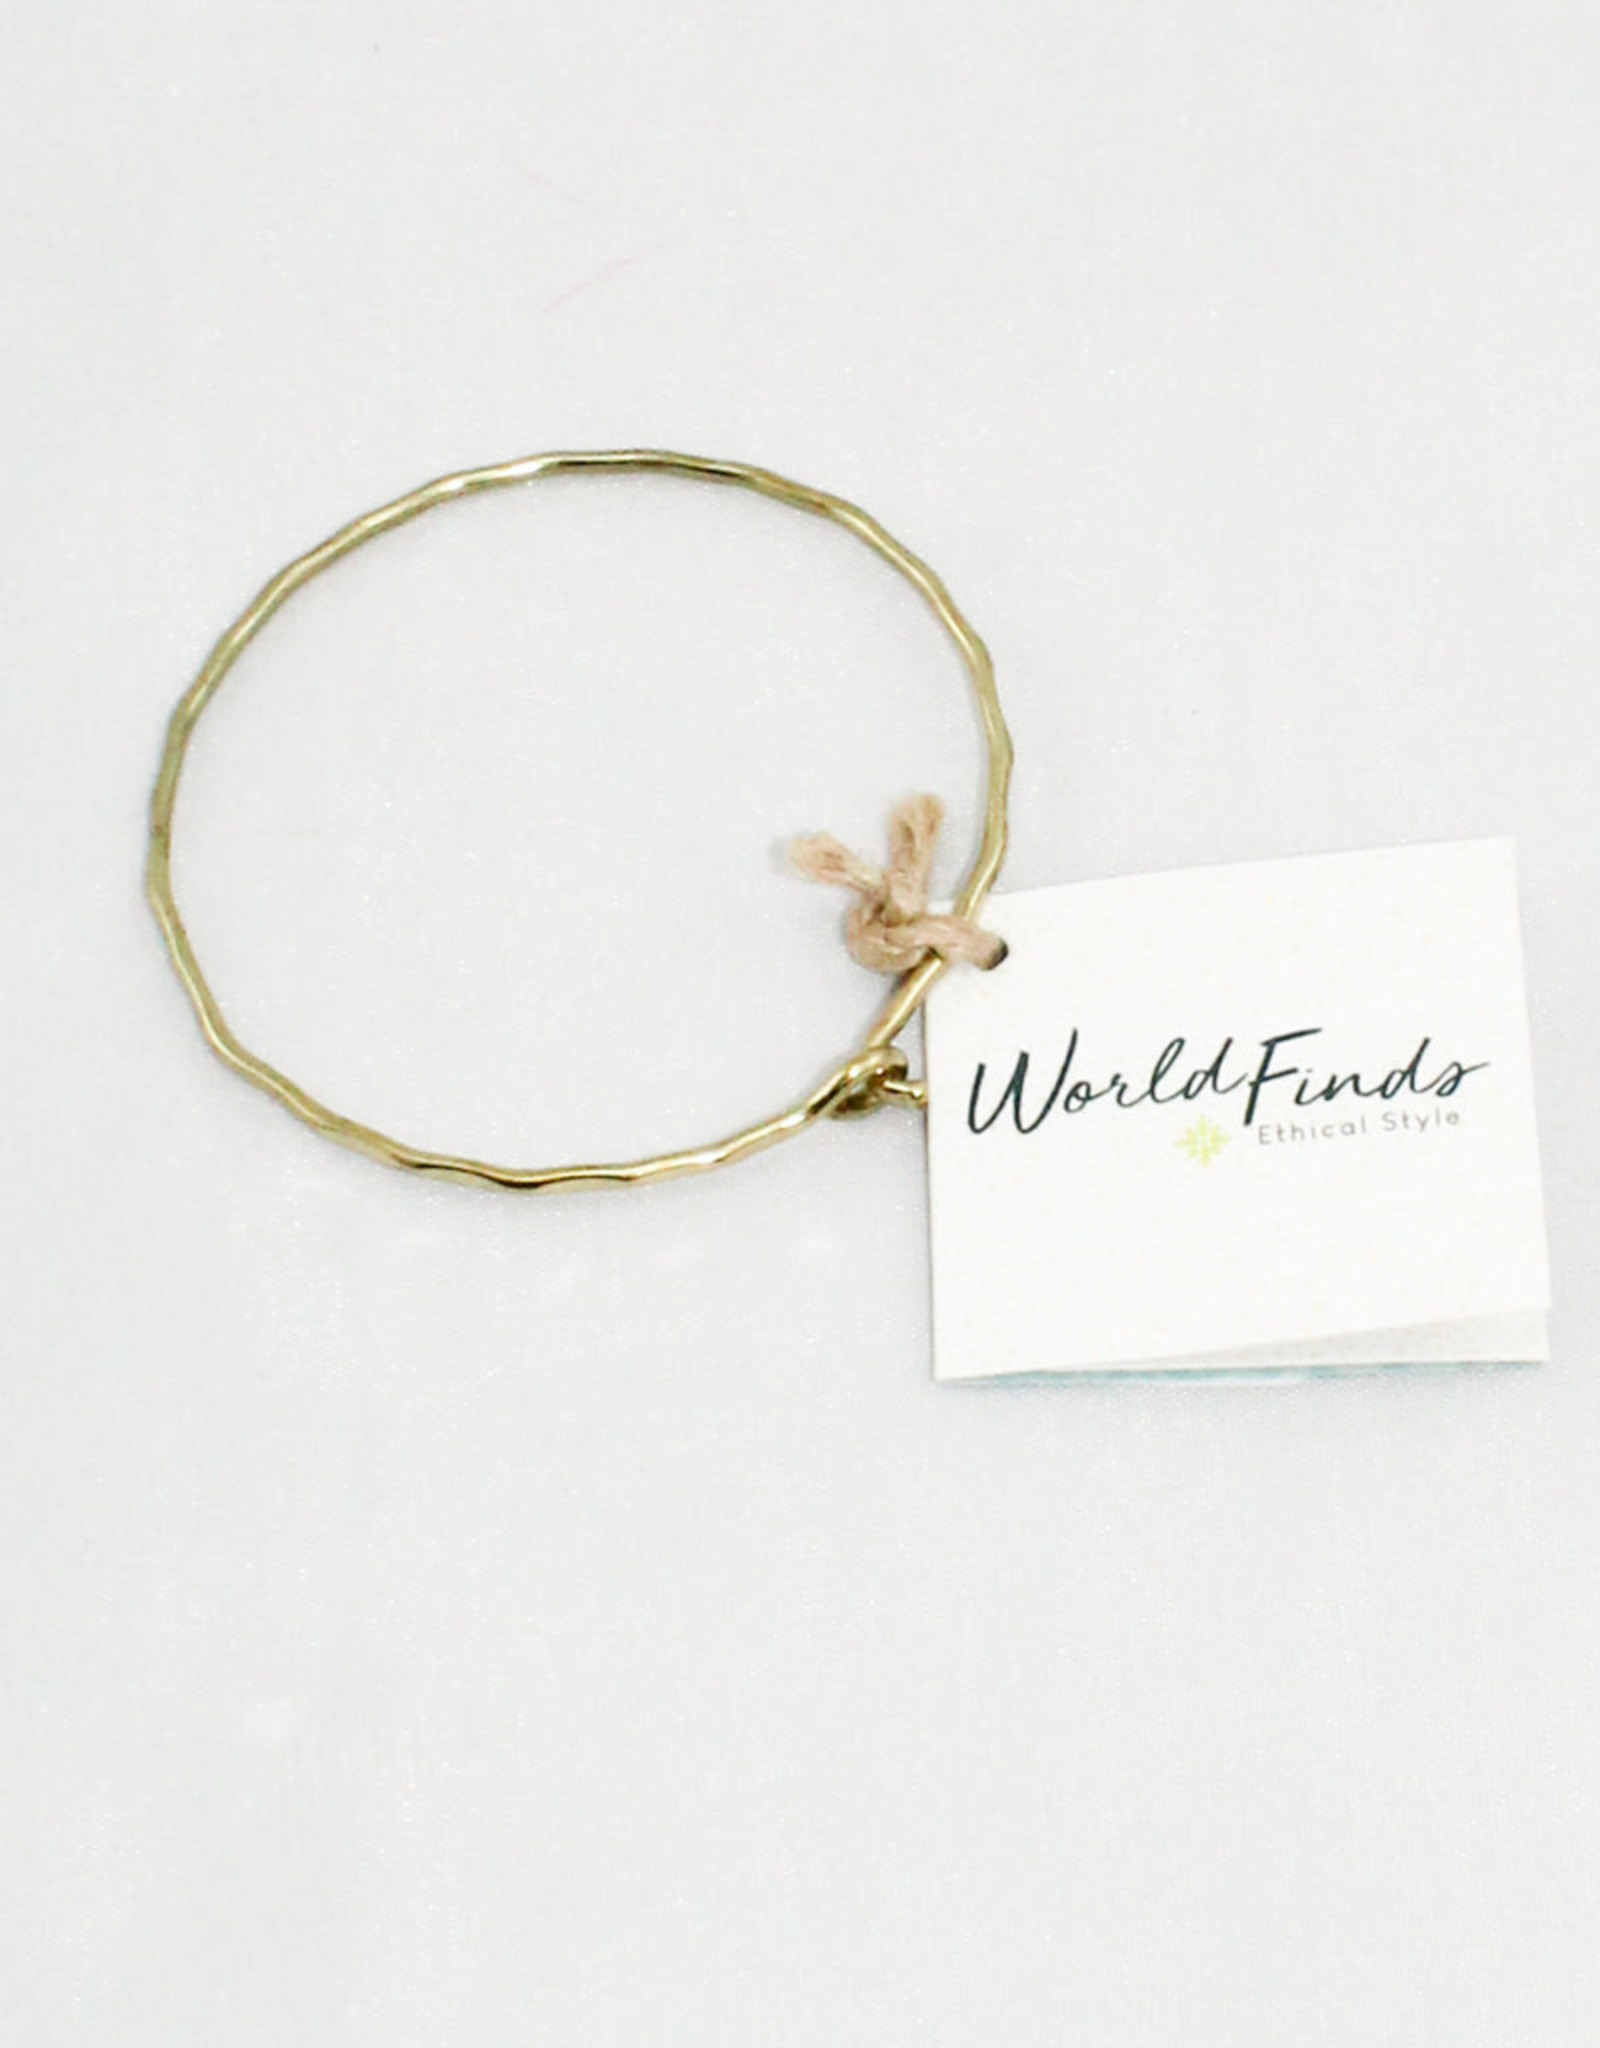 World Finds Gold Ripple Bracelet